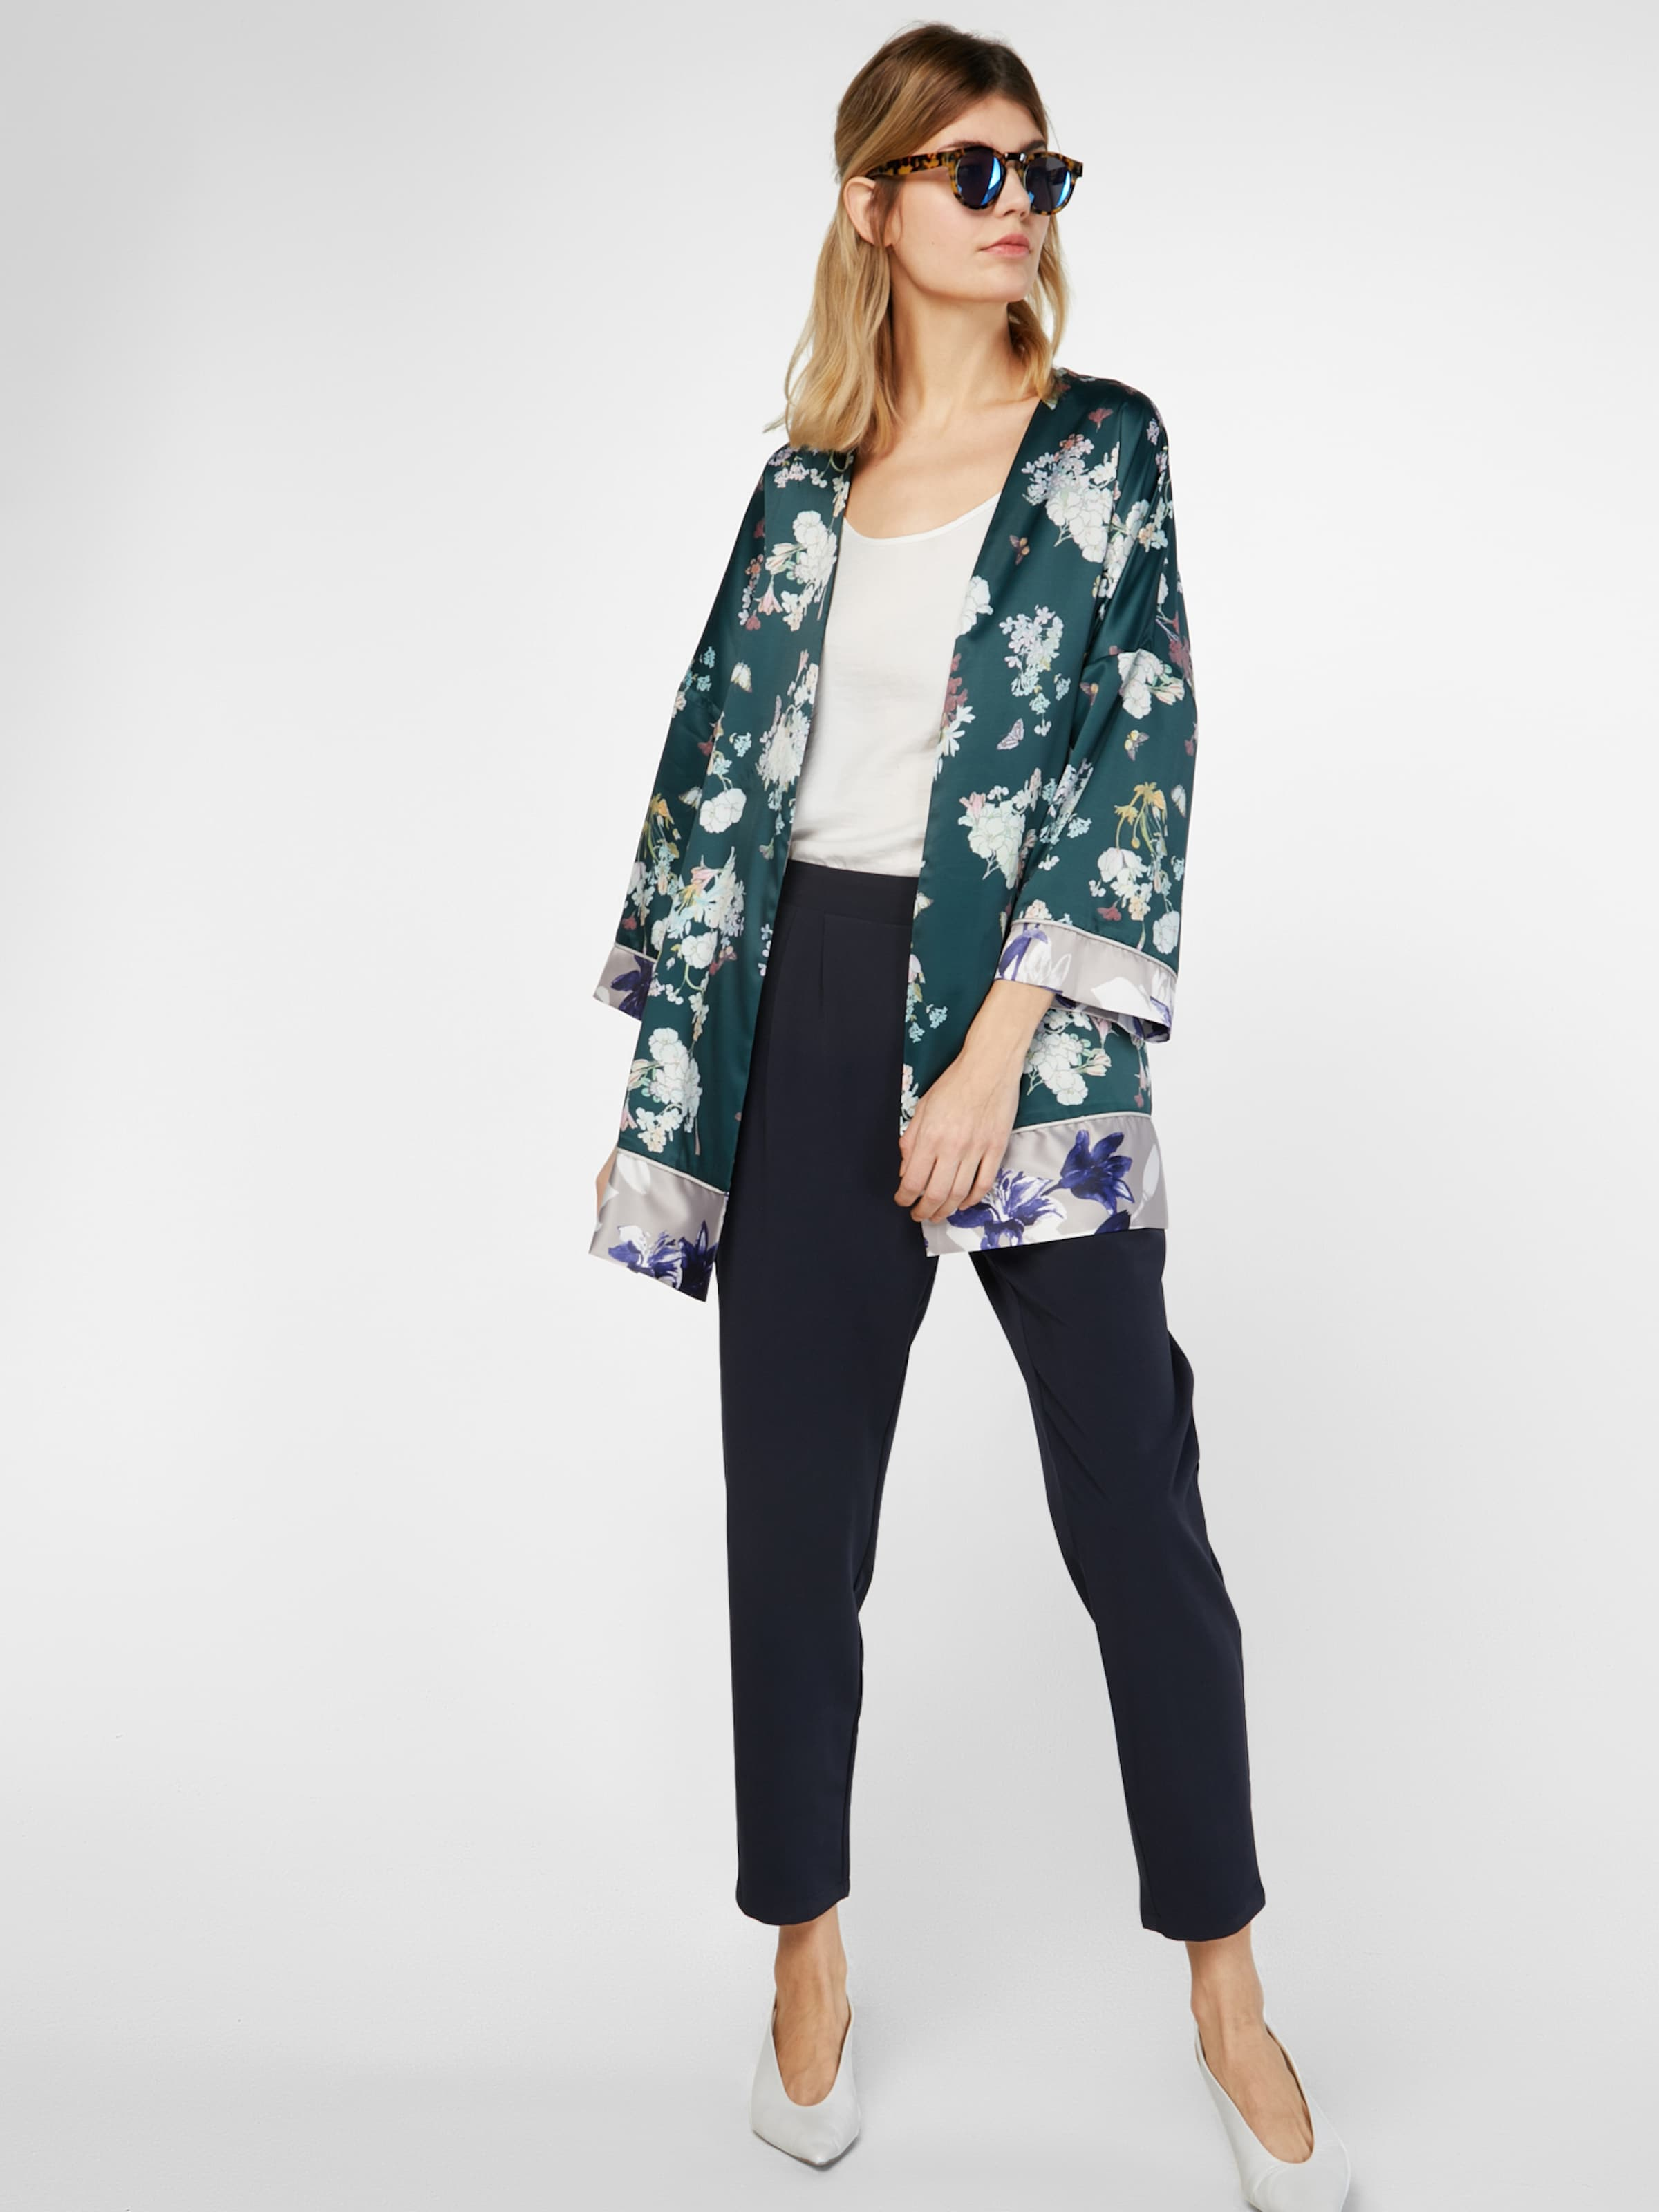 Outlet Große Überraschung ONLY Kimono 'BLUME' Auslass Finish Manchester Günstiger Preis BGUK5W